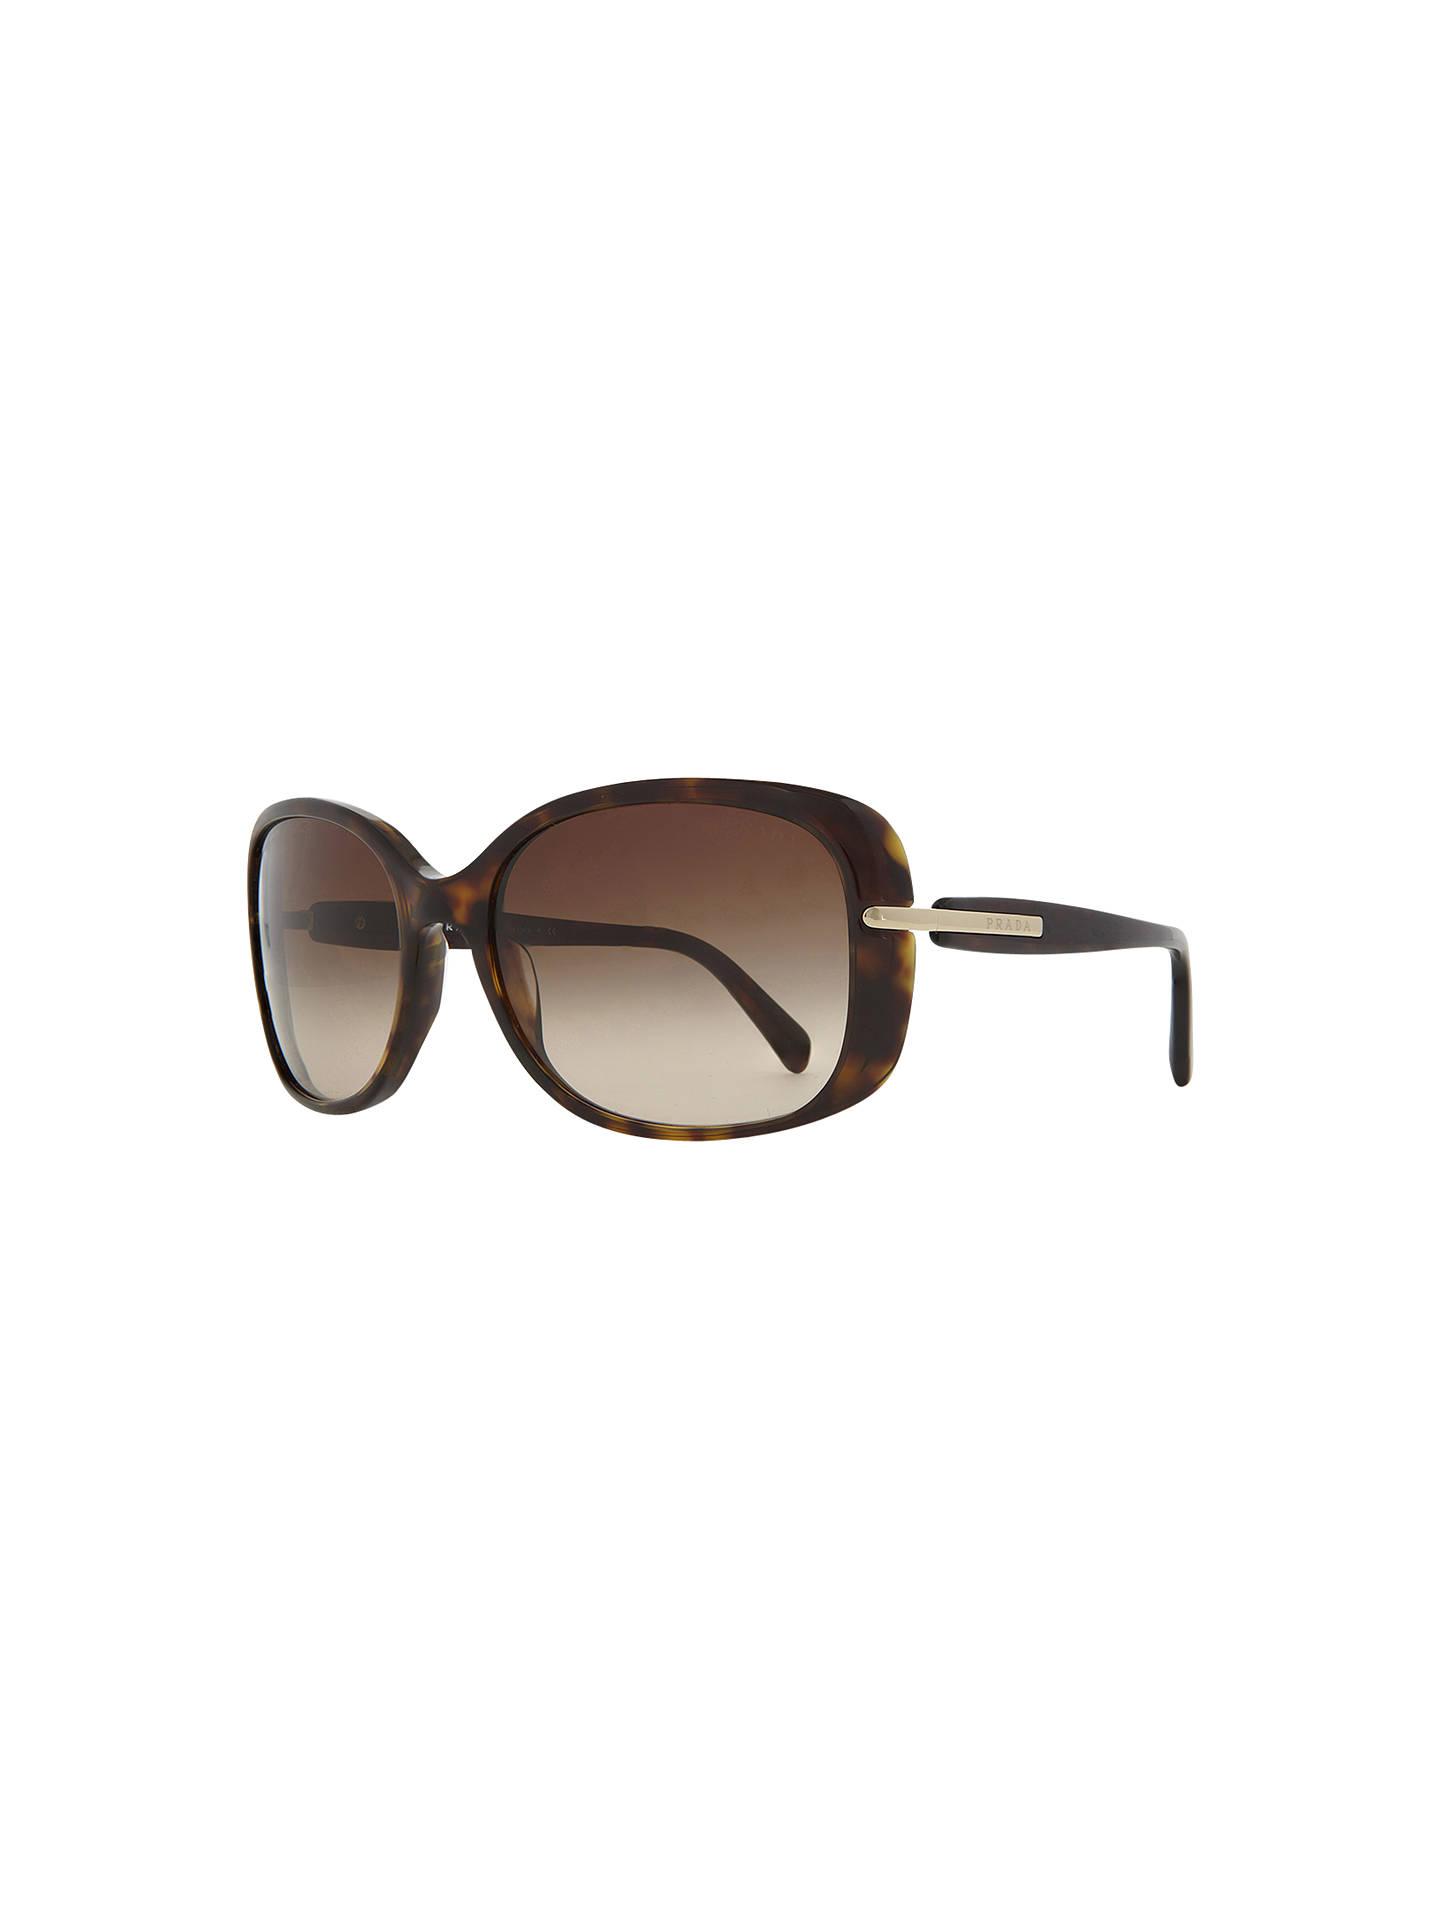 102b972a00a Prada PR08OS Oversized Square Framed Sunglasses at John Lewis   Partners